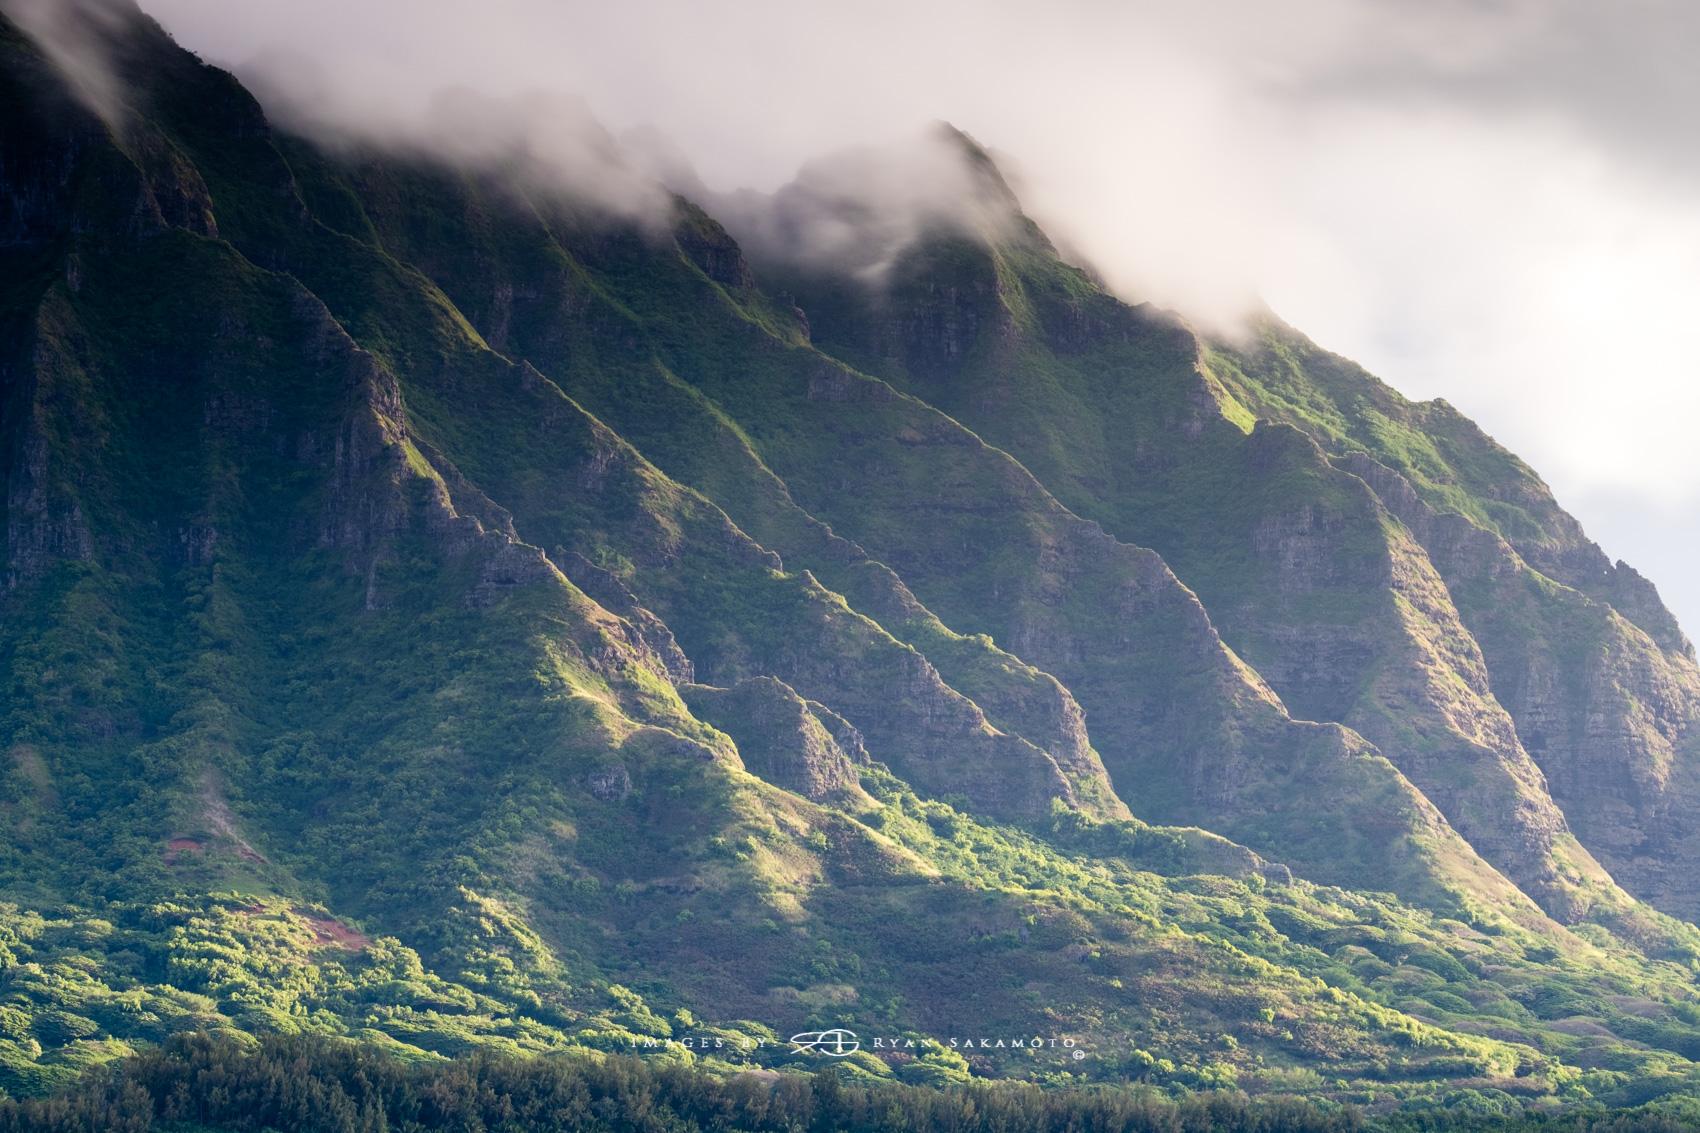 Sunrise at Waihole Beach,Honolulu, Hawaii  Fuji XT2  |  3 sec. |  f/10|  ISO 100  |    Fujinon XF100-400mm f/4.5-5.6 R LM OIS WR  Edited in Lightroom & Photoshop CC  Copyright 2017 Ryan Sakamoto, All rights reserved